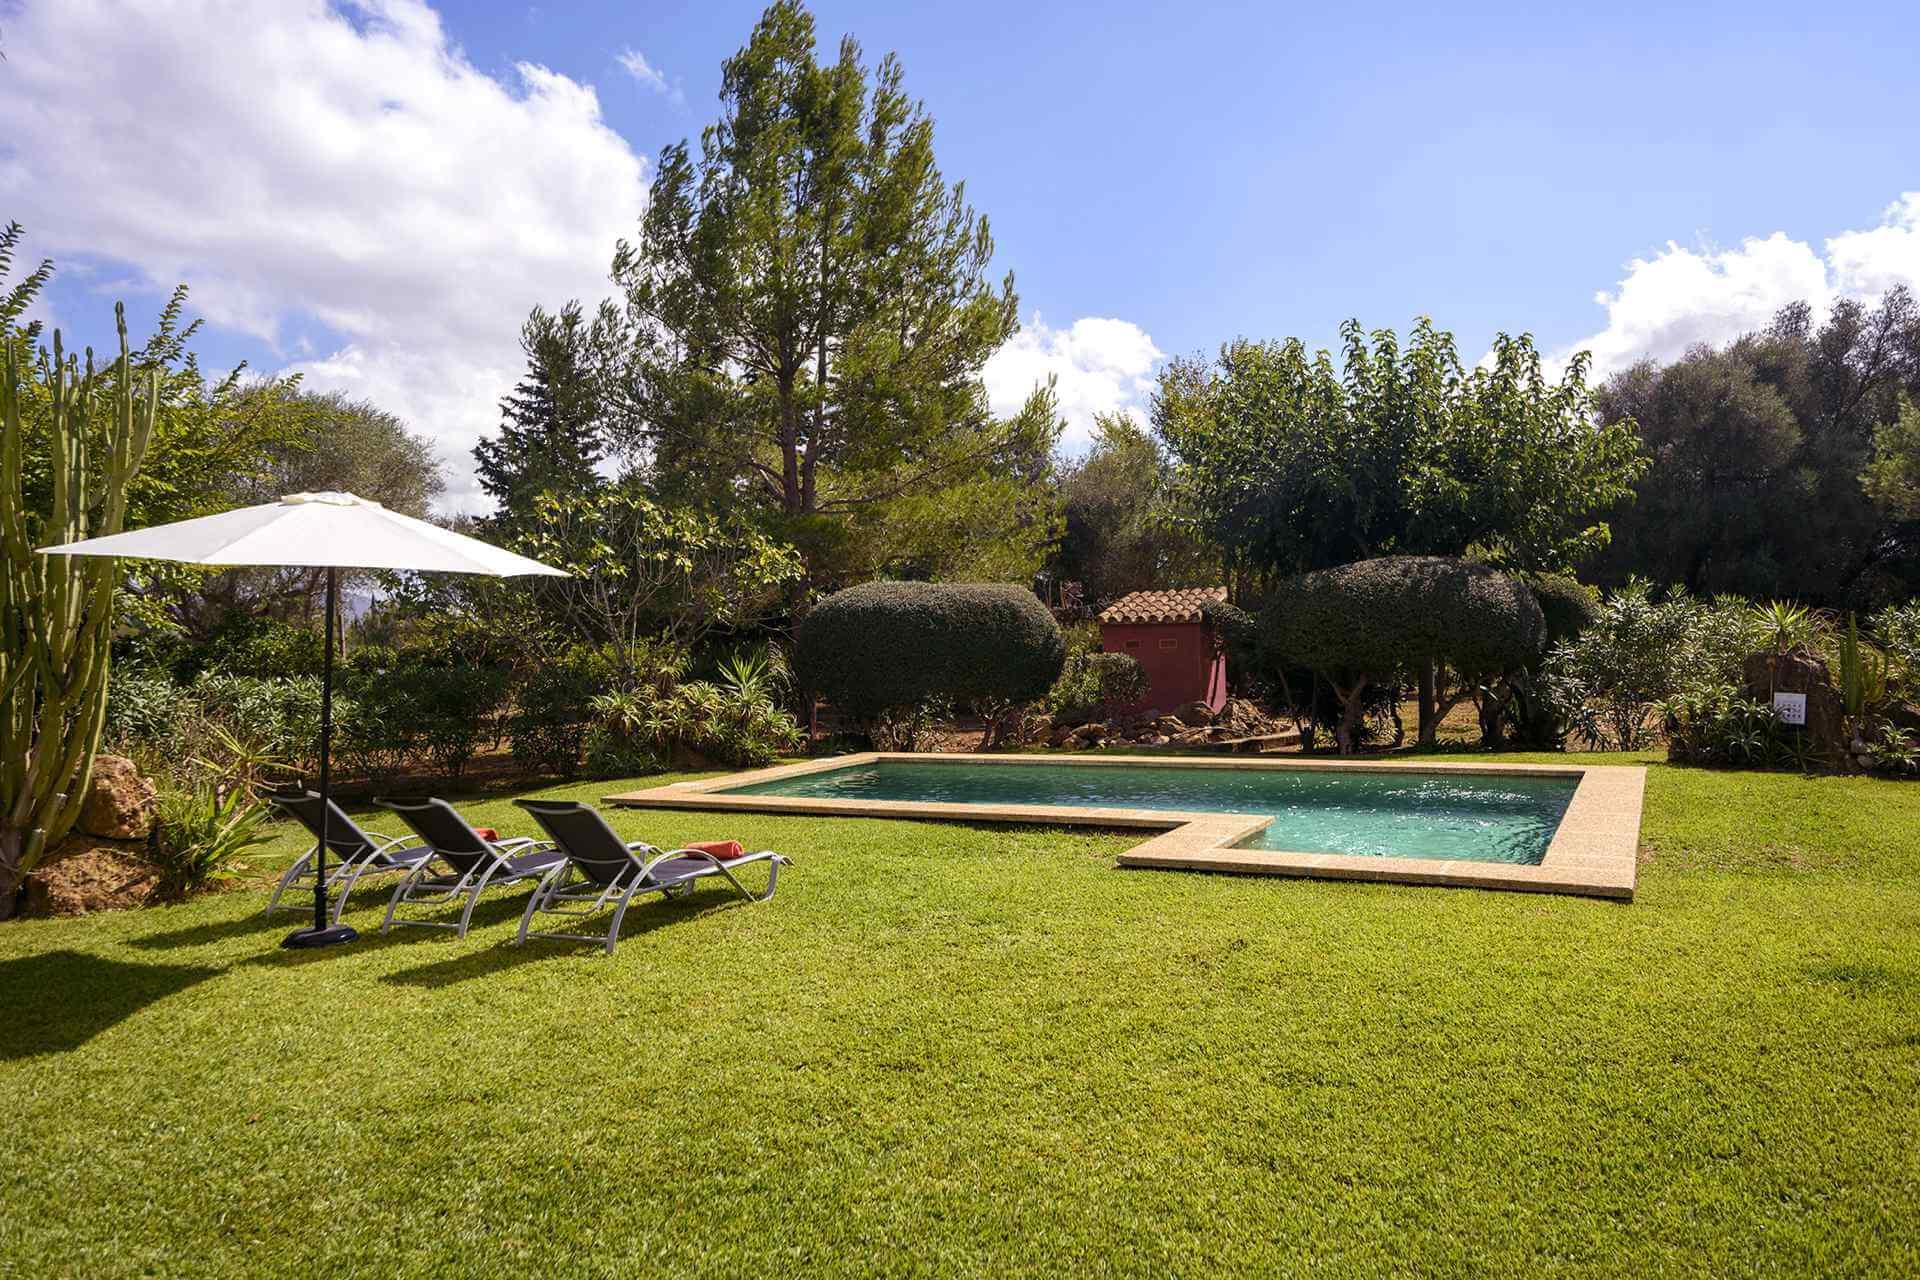 01-161 Finca mit hübschem Garten Mallorca Norden Bild 3